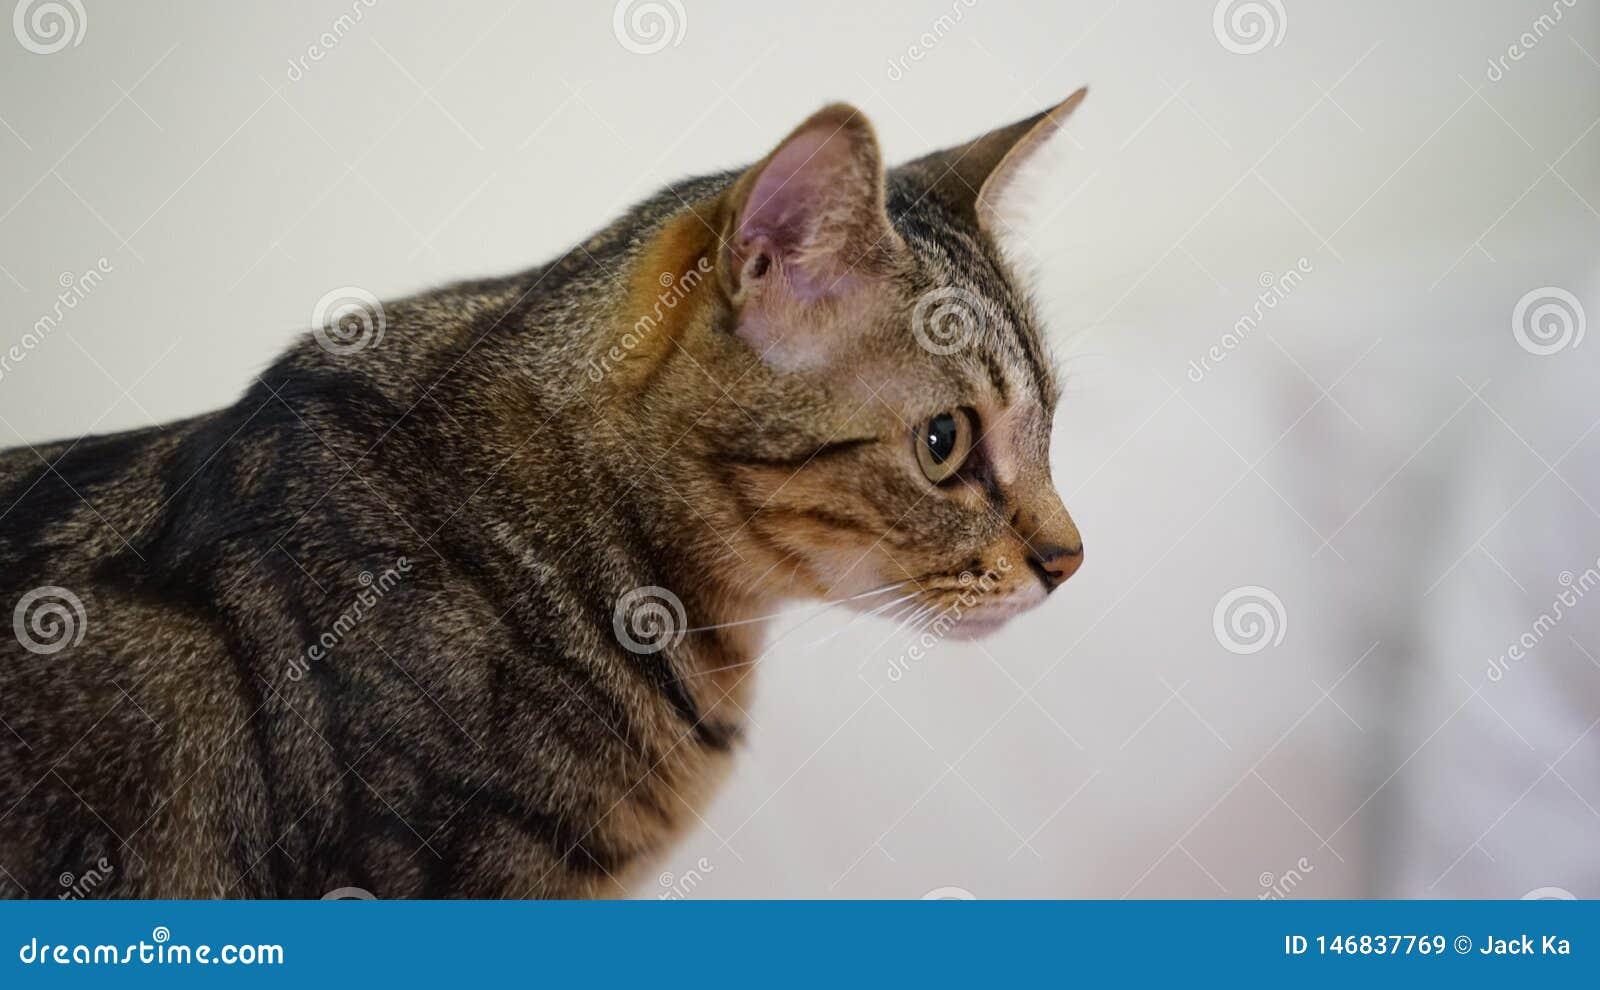 Close up a cat shot